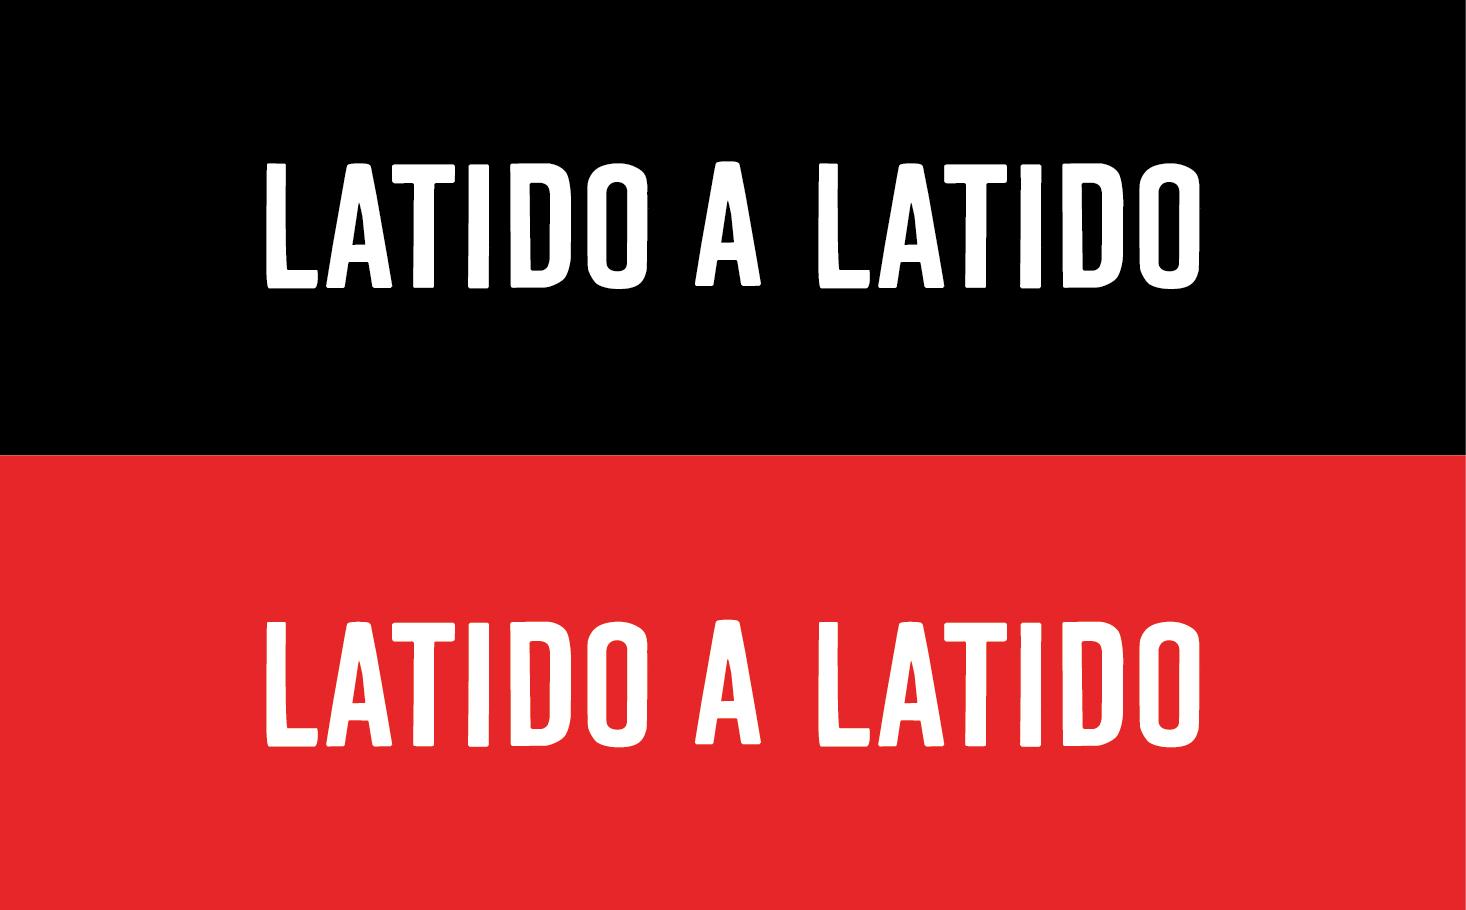 Latido-a-Latido-02-02.jpg